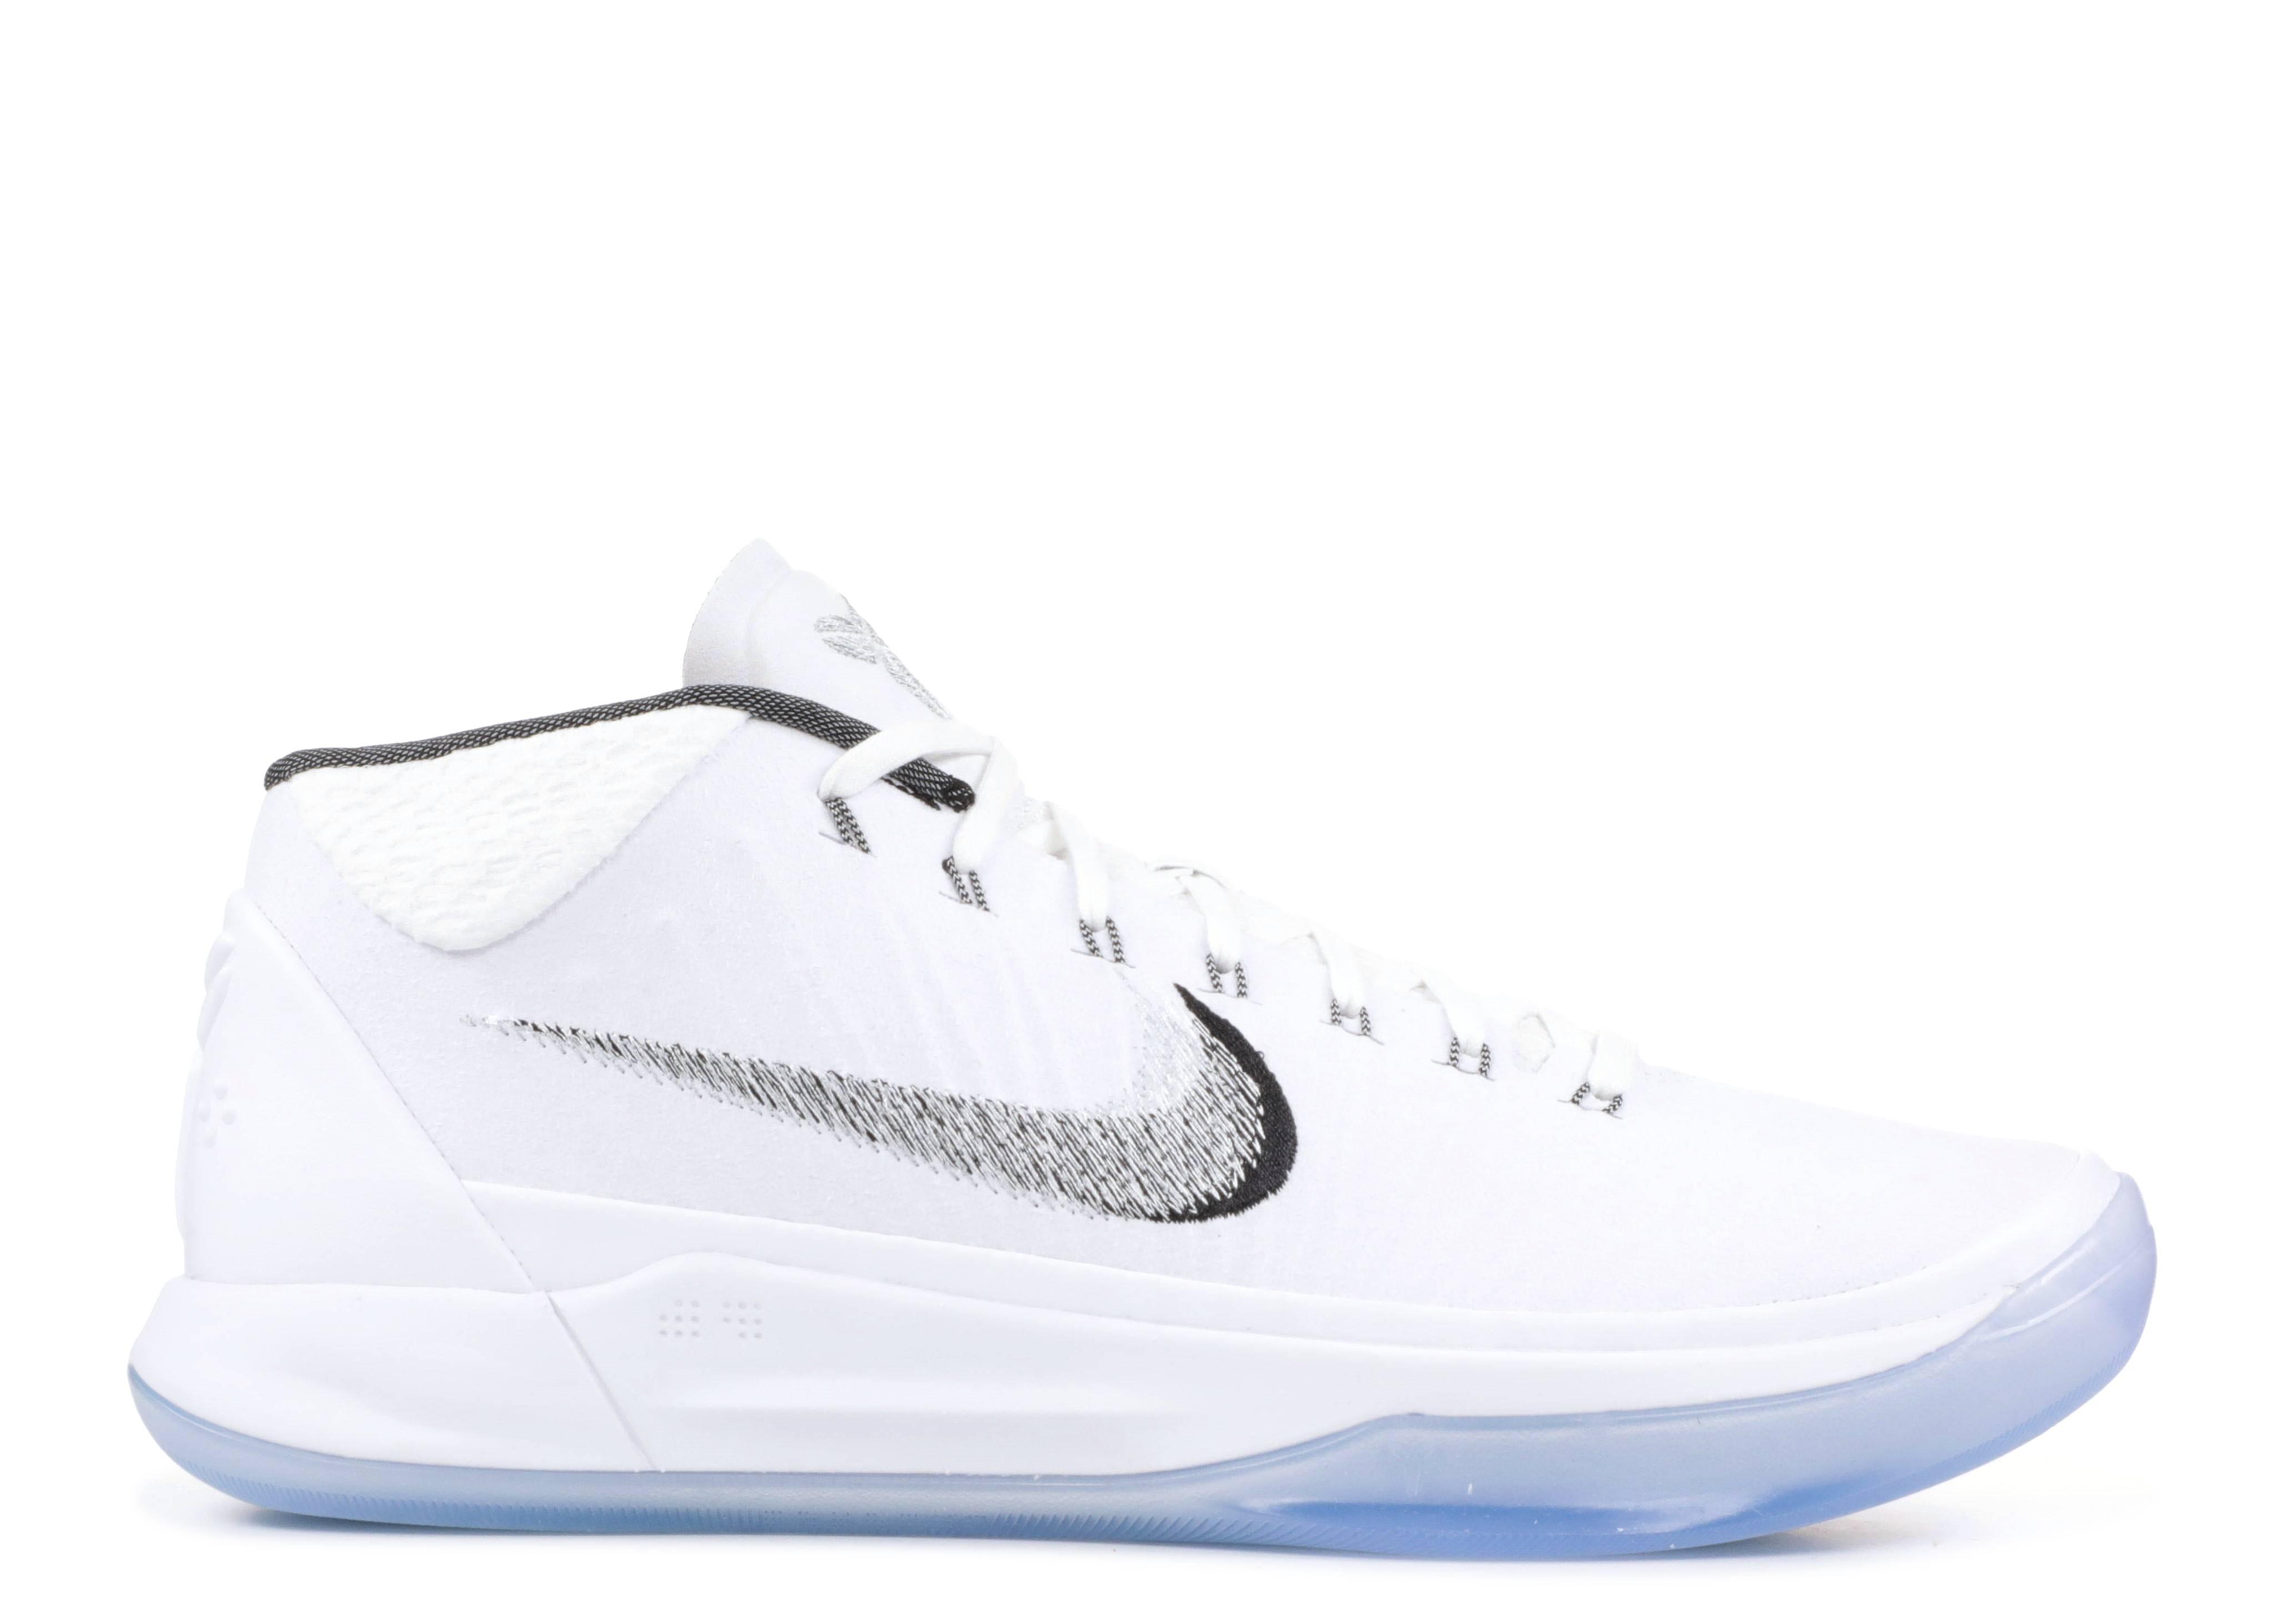 88db1ba39b01 Kobe Ad - Nike - 922482 102 - white metallic silver-ice